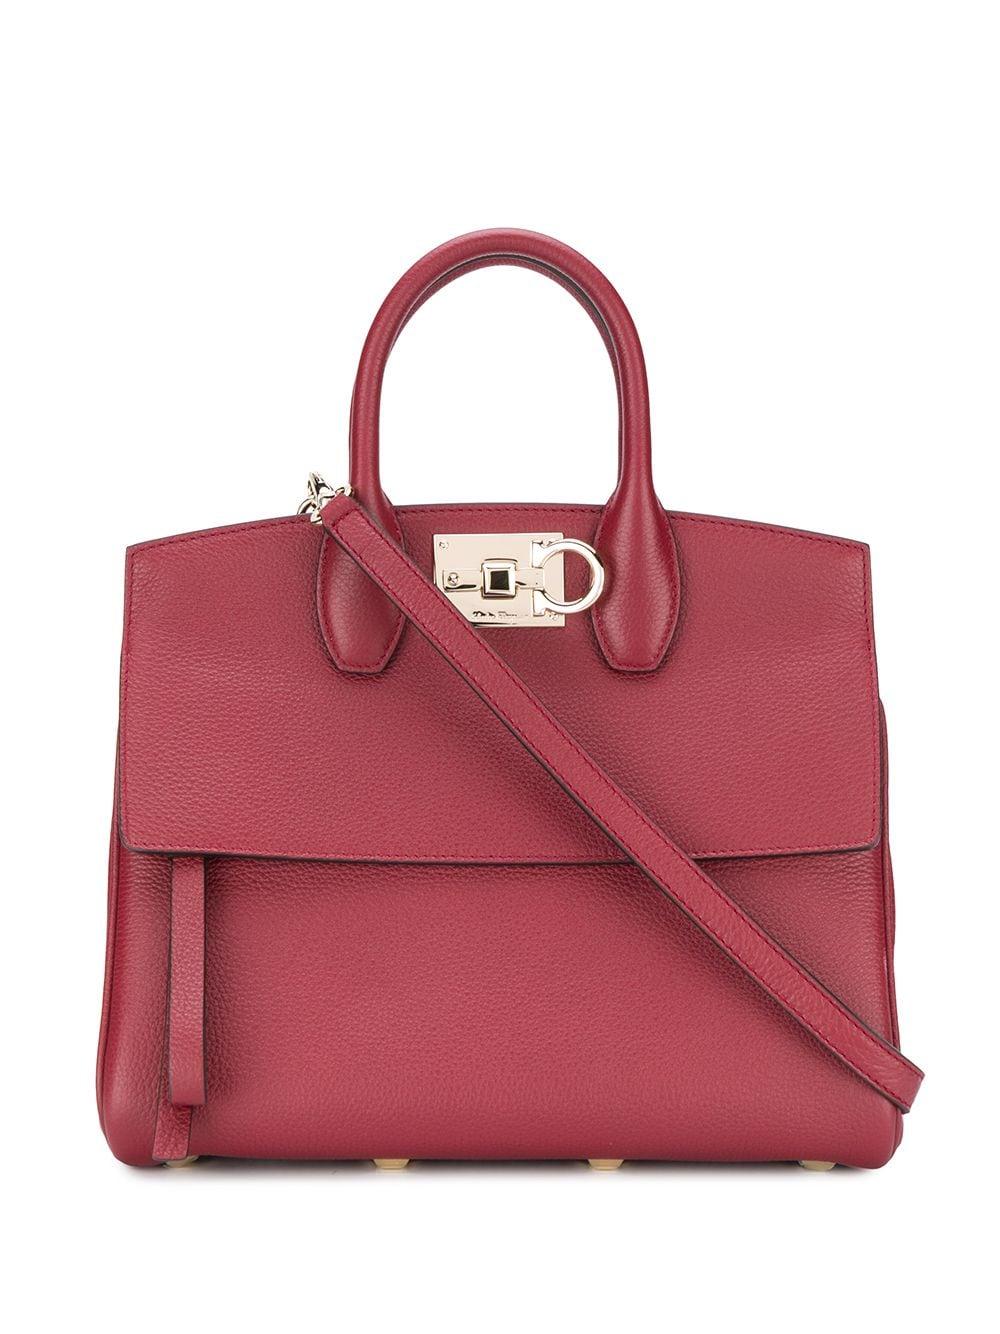 The Studio Small Leather Handbag